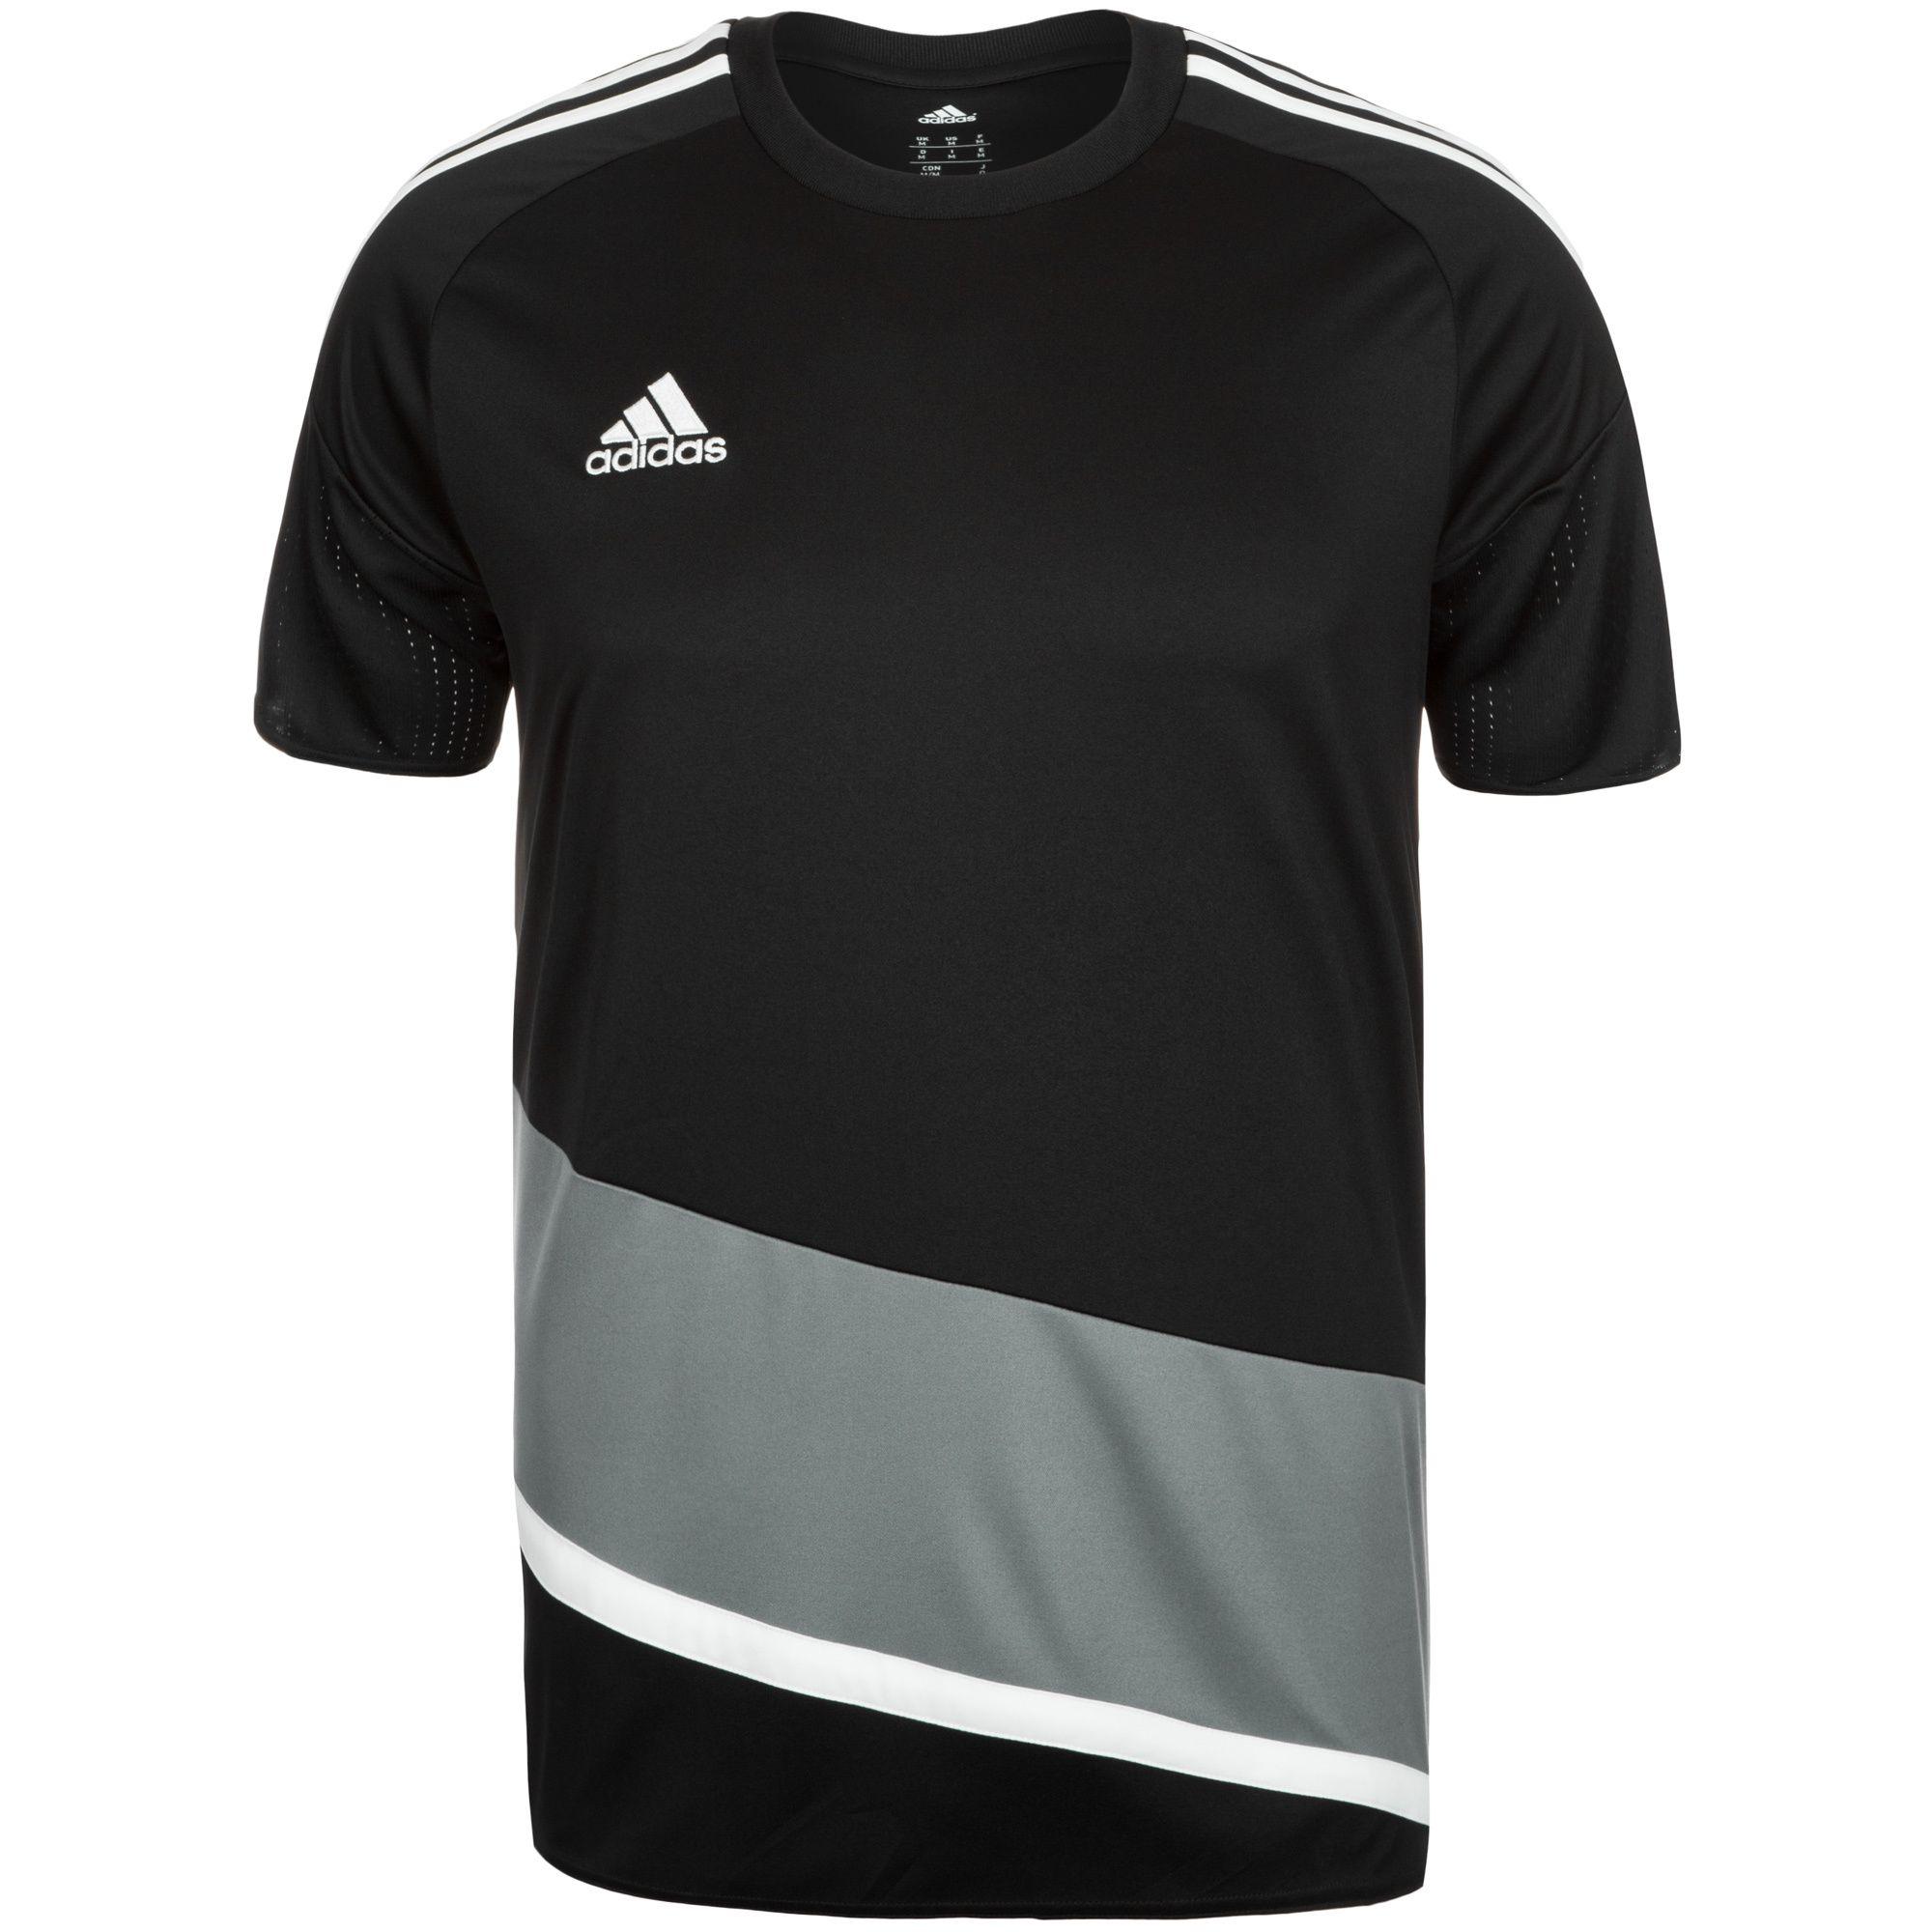 ADIDAS PERFORMANCE adidas Performance Regista 16 Fußballtrikot Herren